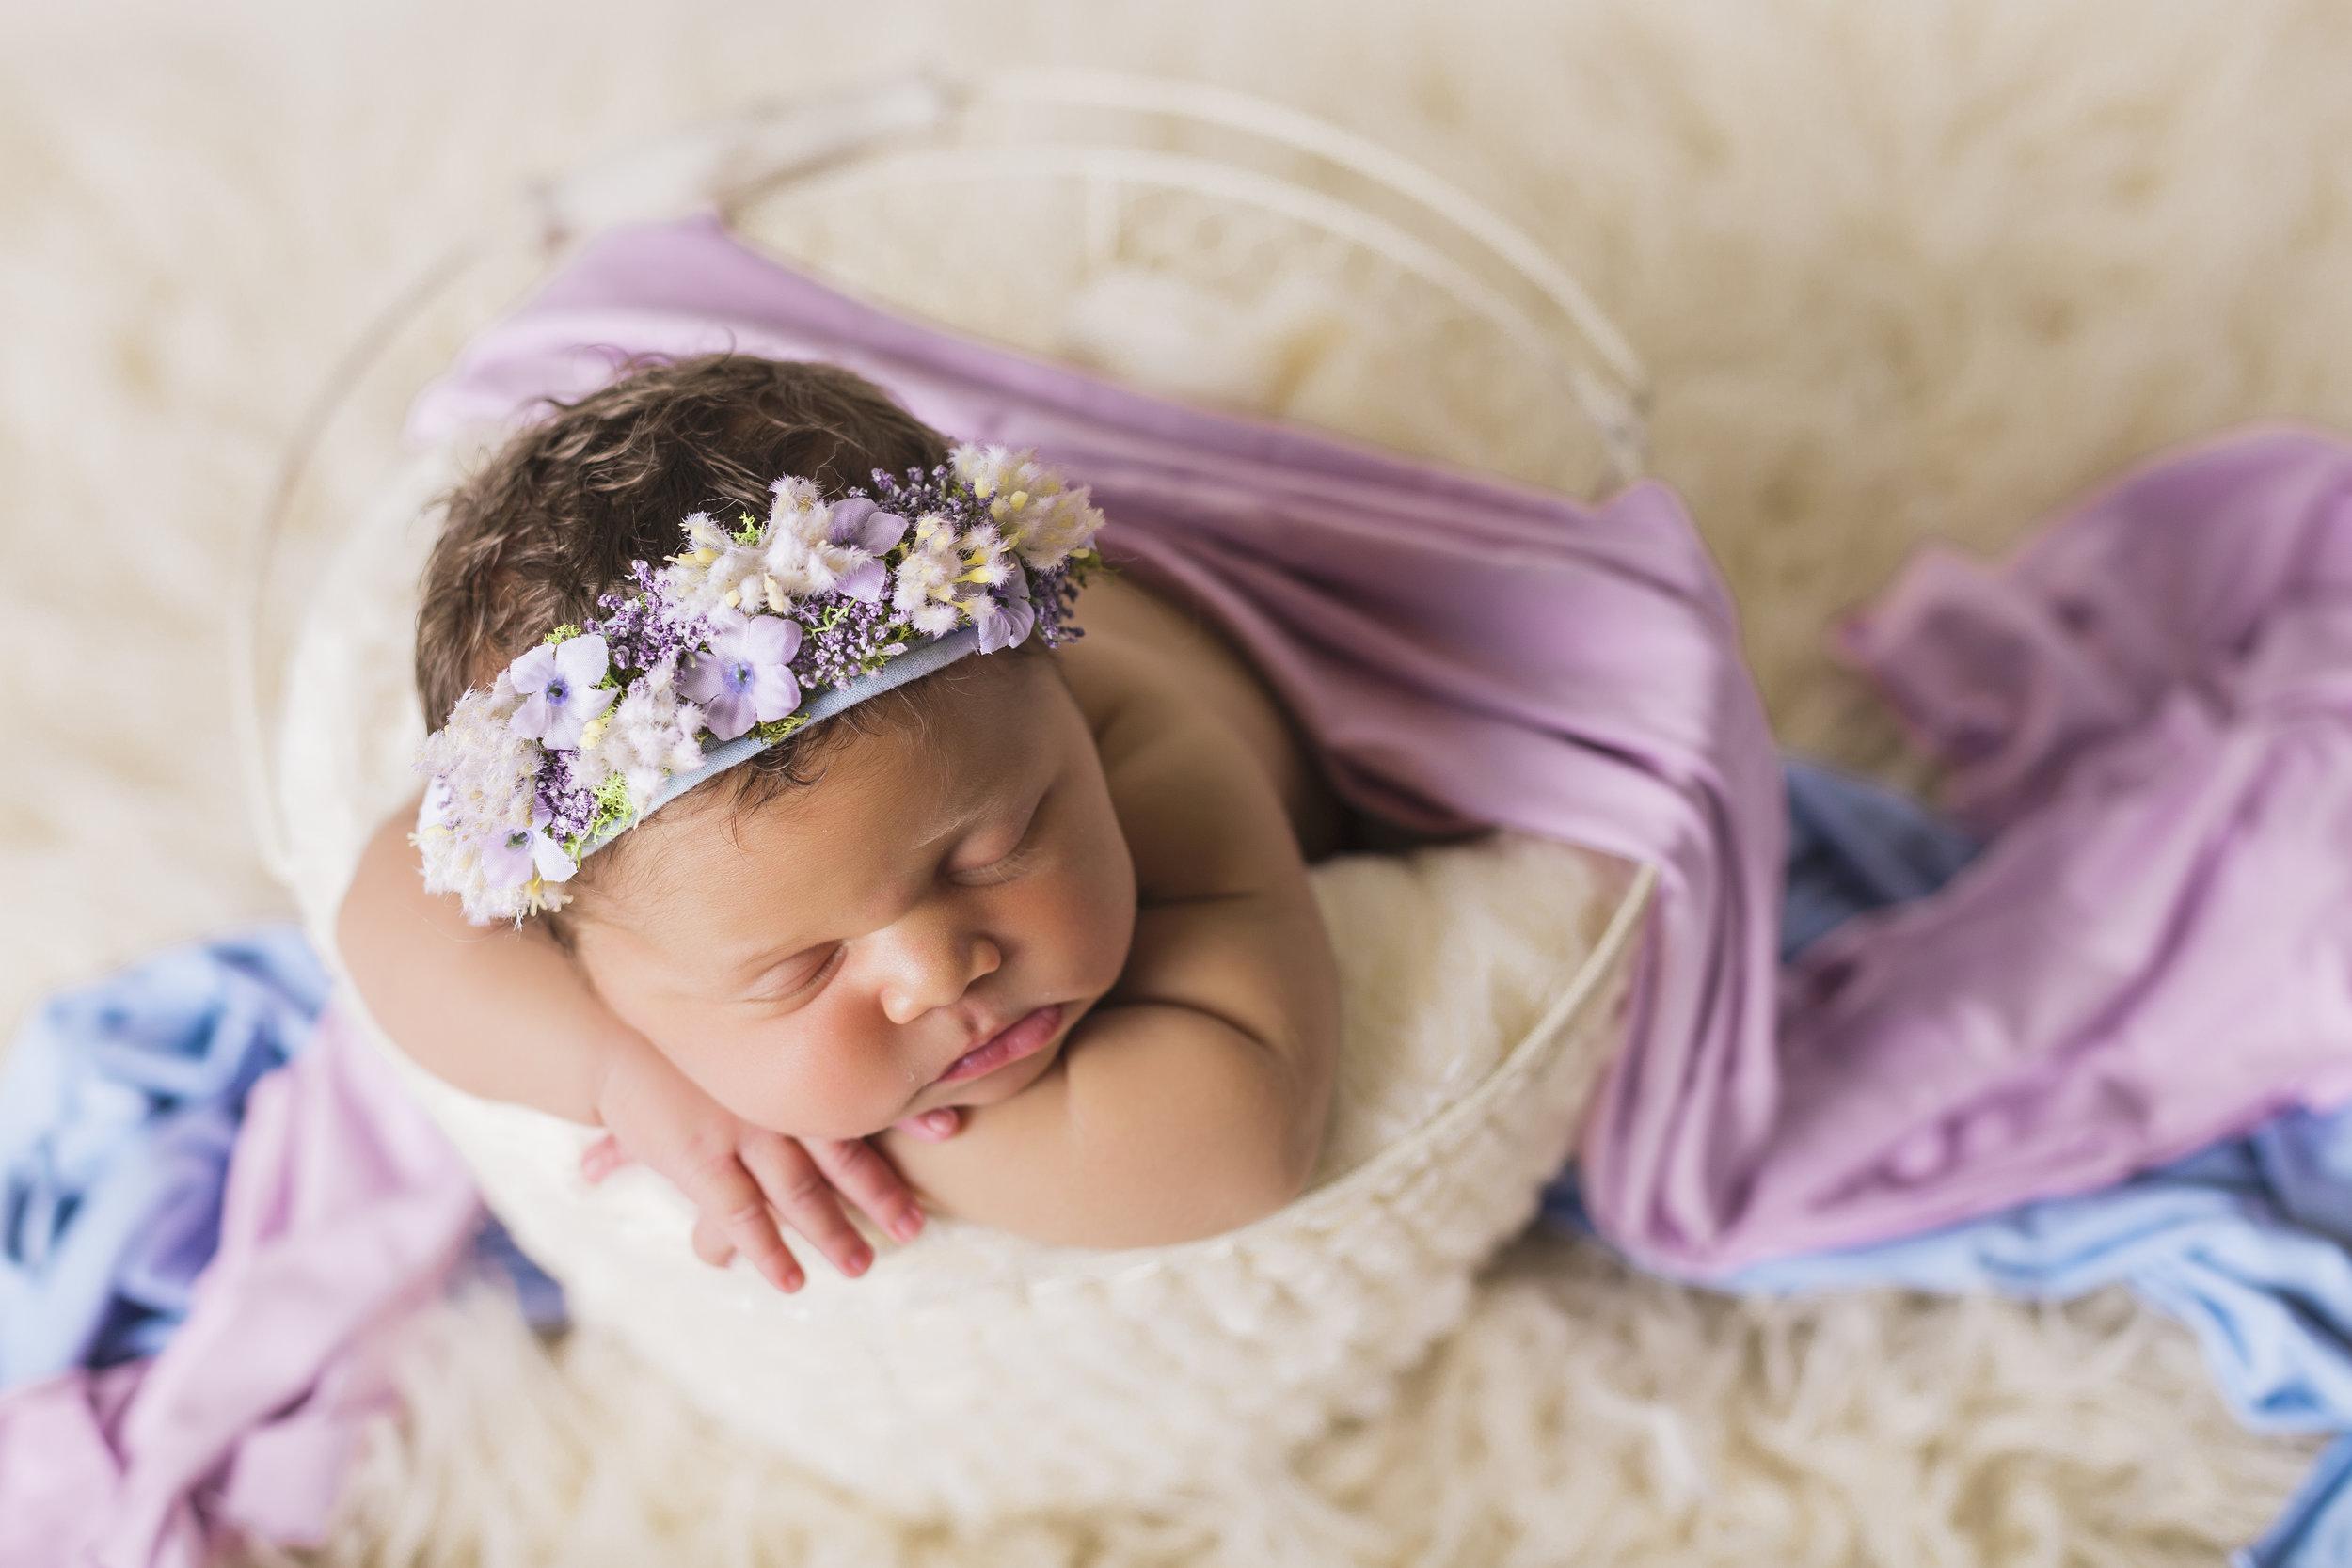 BabyRiley_Newborn-03.jpg